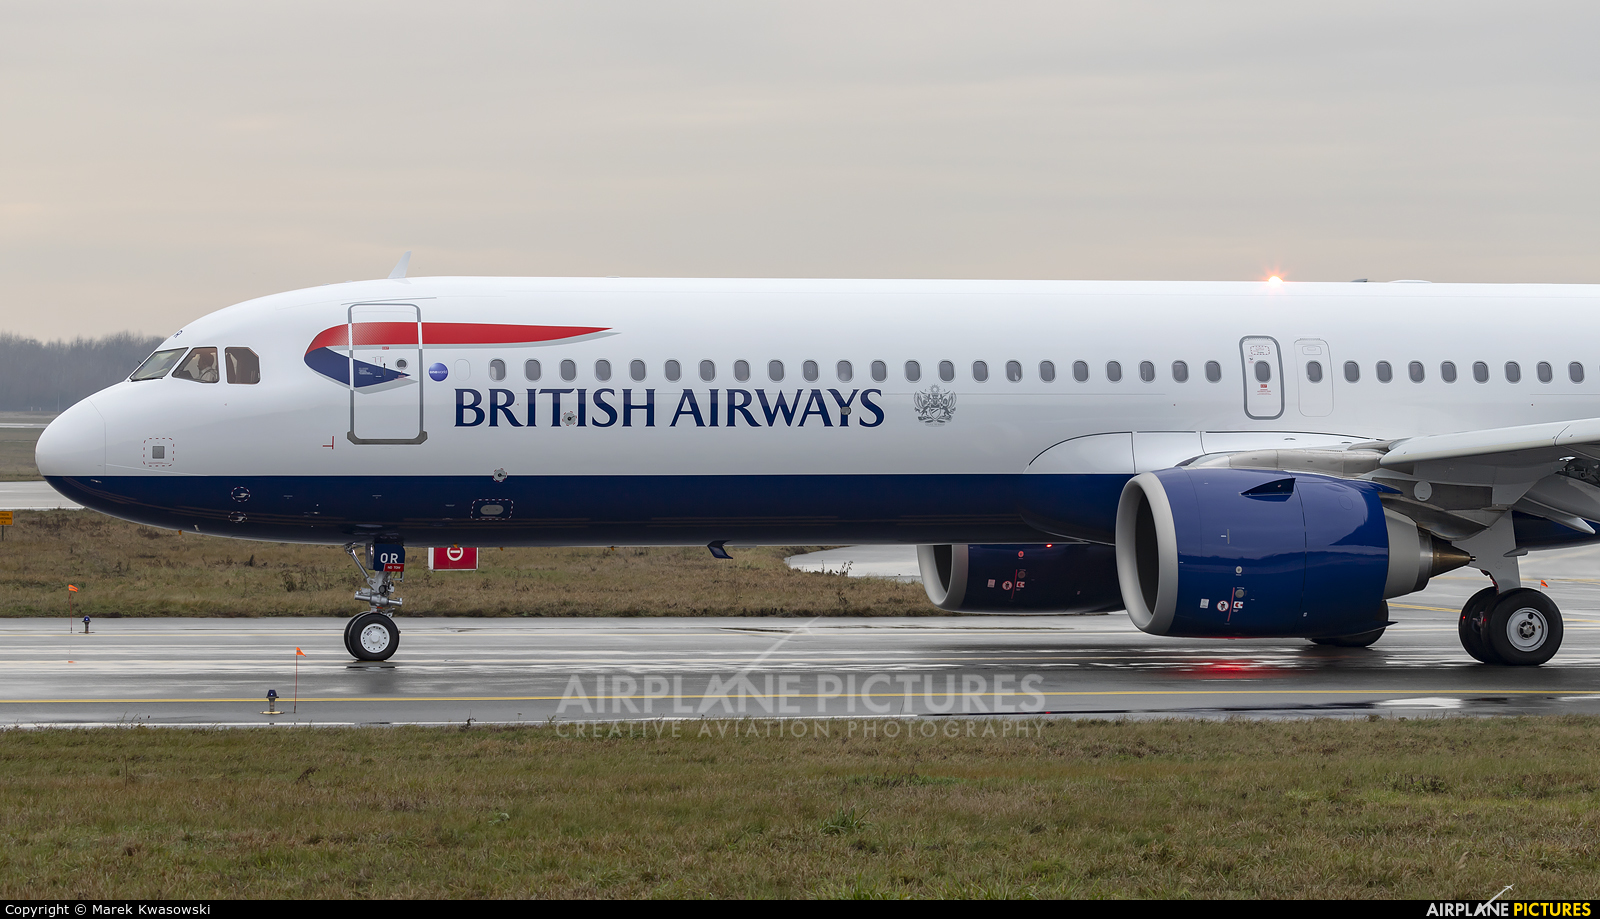 British Airways G-NEOR aircraft at Warsaw - Frederic Chopin